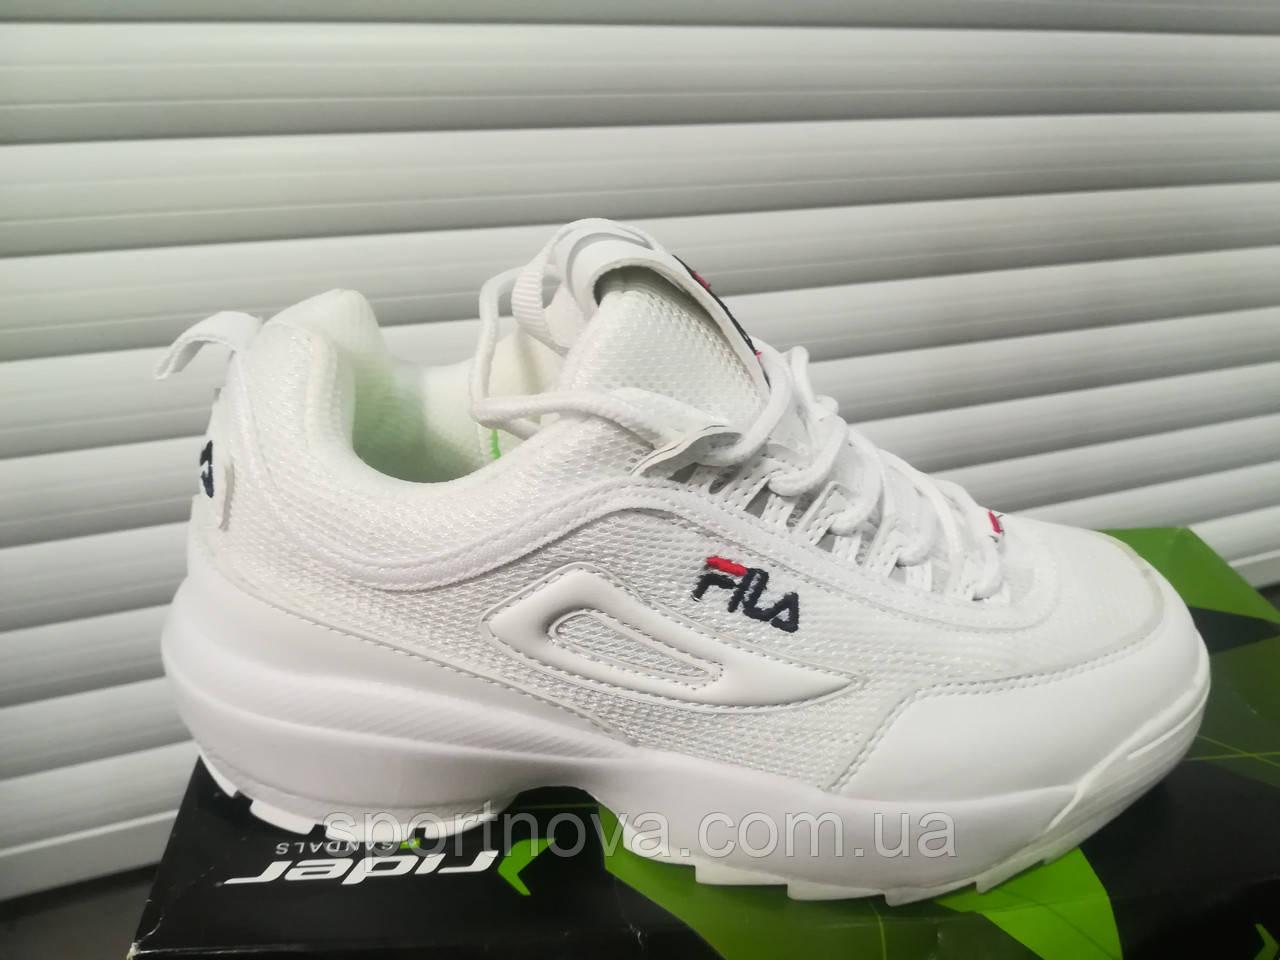 e8e552d9f2ec Кроссовки Fila Disruptor 2 White (лето) - Интернет-магазин спортивной обуви  и одежды